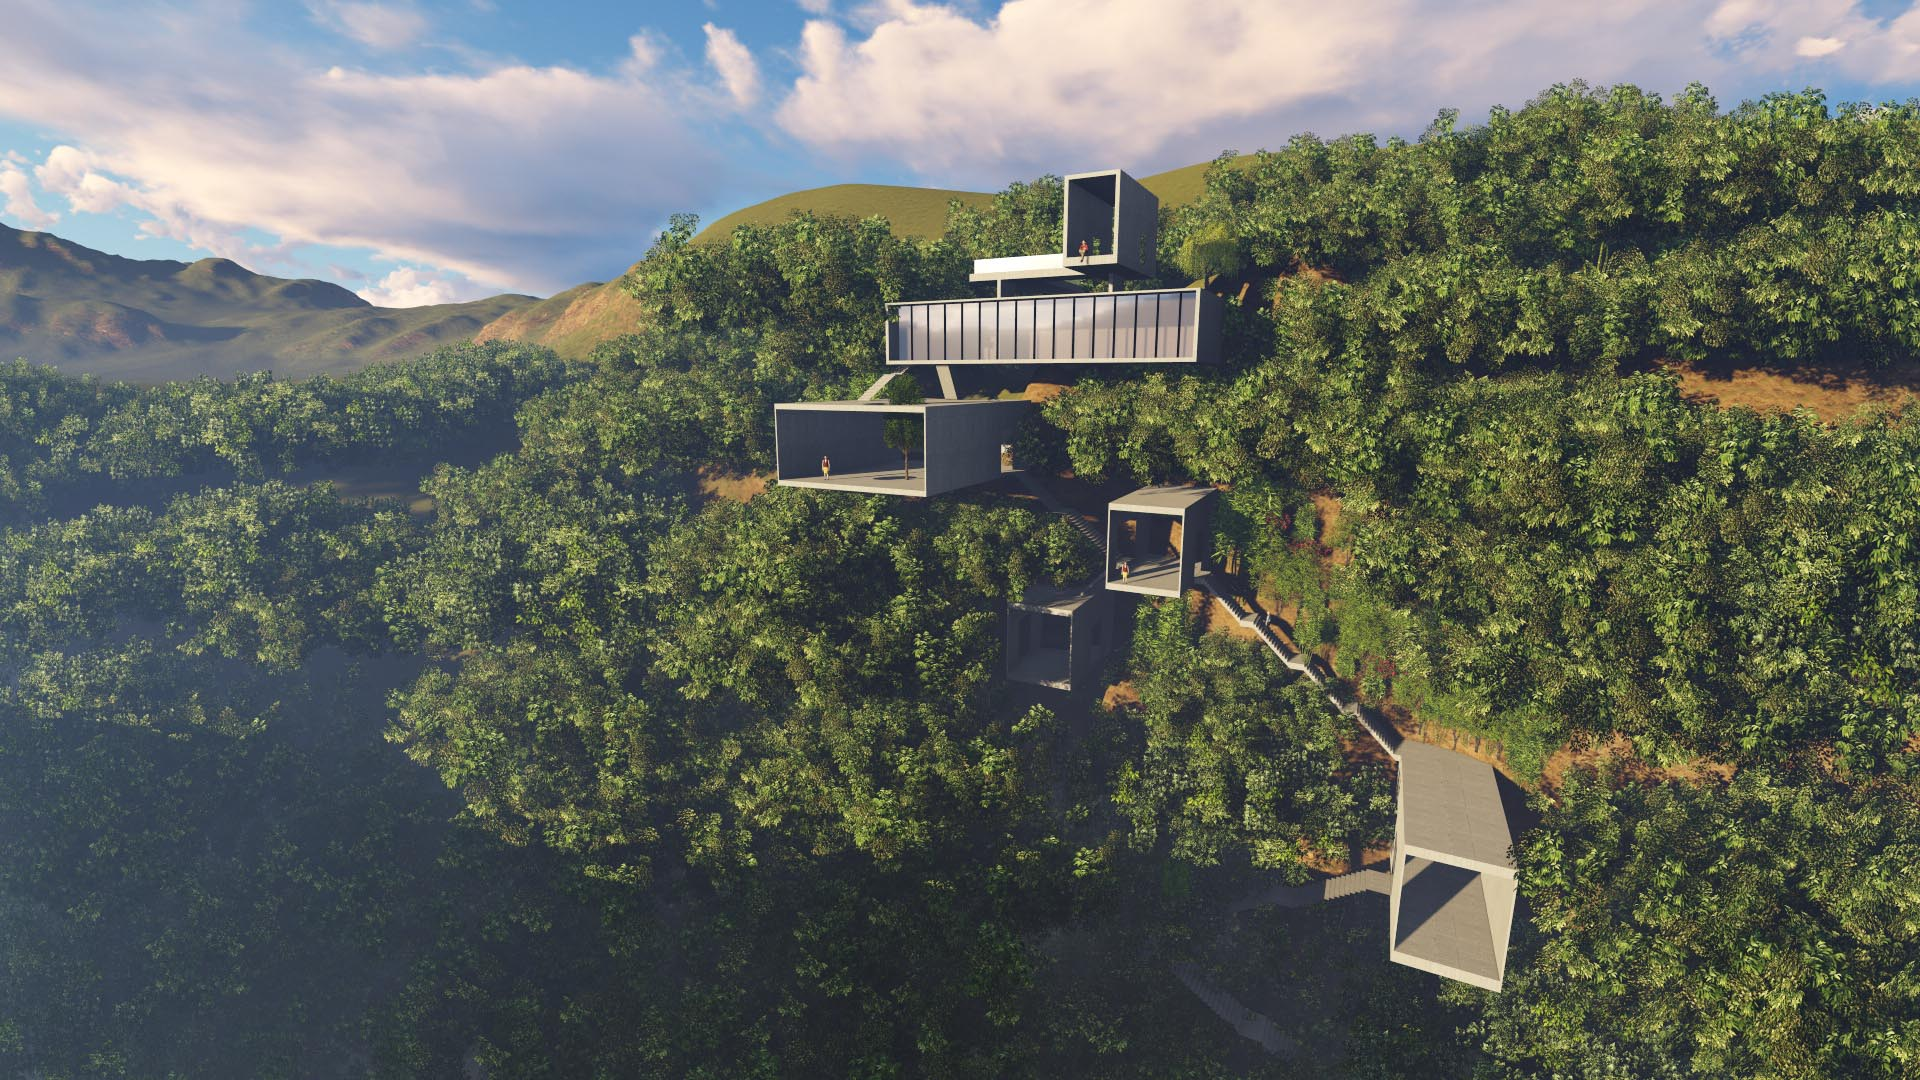 Chongqing Cliff Restaurant Architecture 事建组